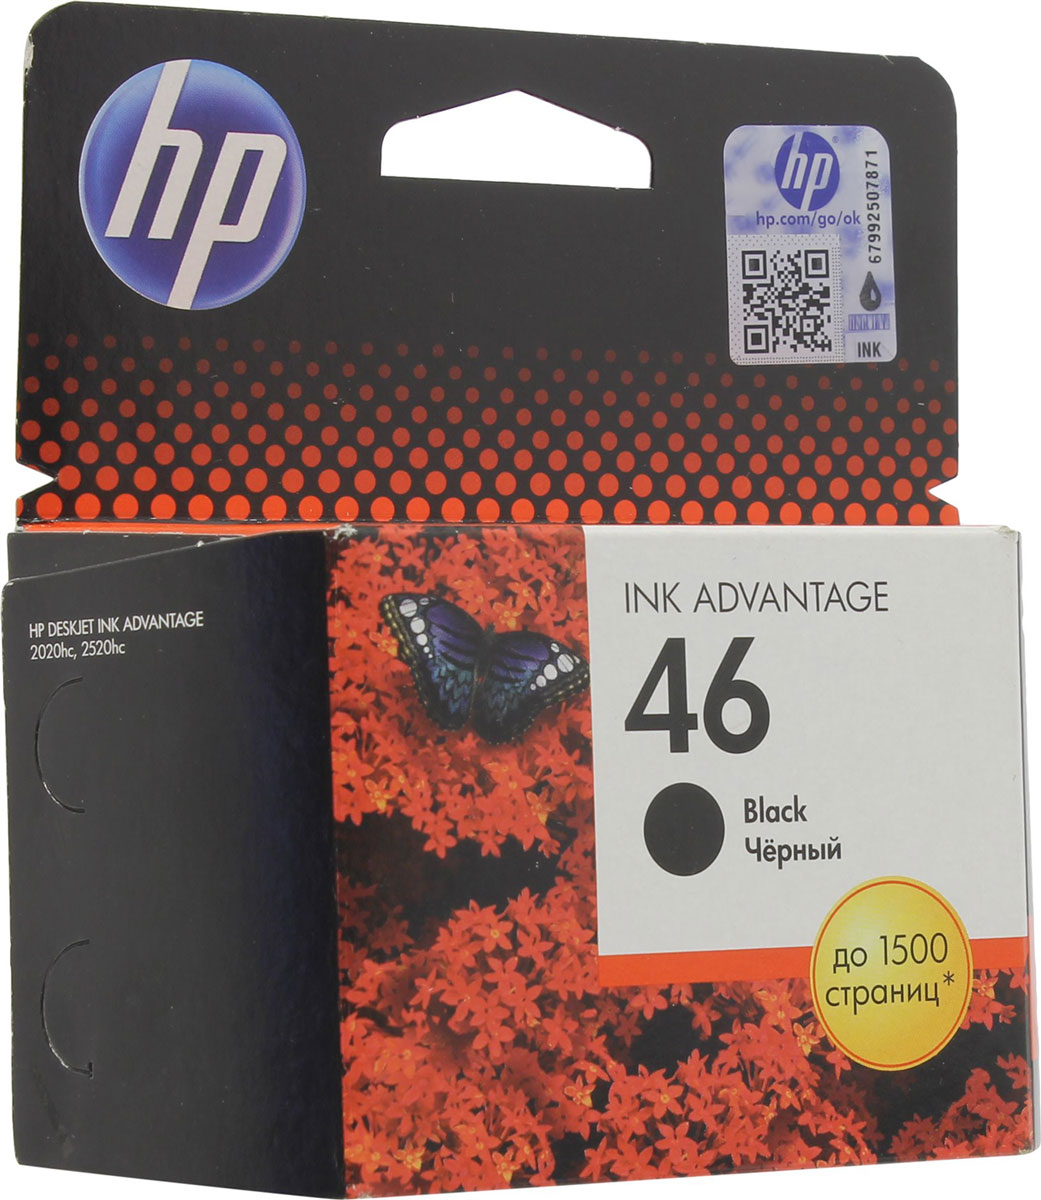 HP CZ637AE (HP 46), Black картридж для 2020hc (CZ733A)/ 2520hc (CZ338A)/4729 чернильный картридж hp 46 cz637ae black